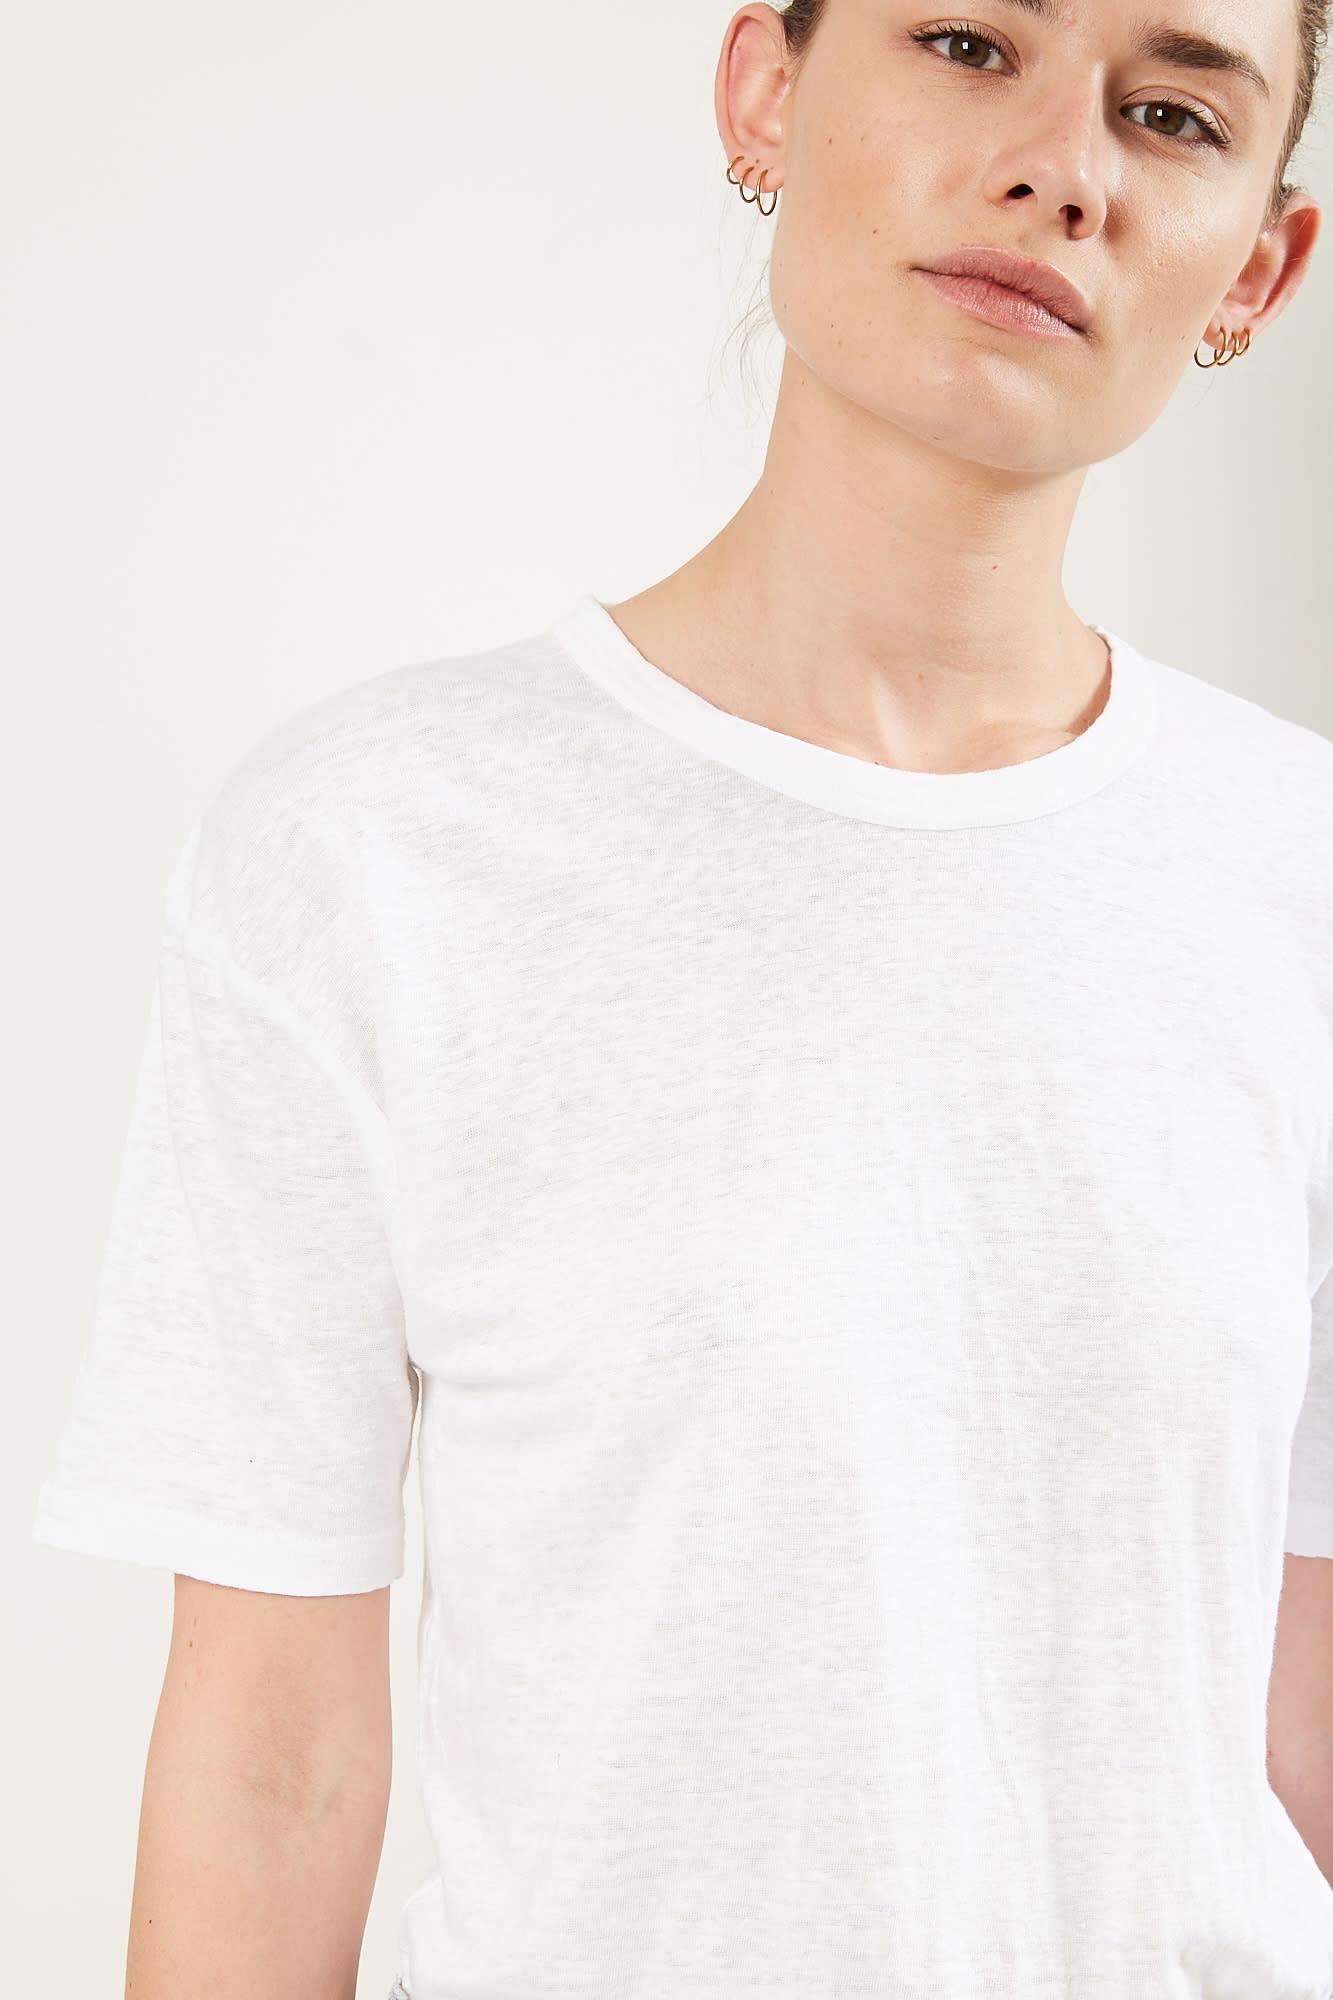 Etoile Isabel Marant - keiran tee shirt 20wh white